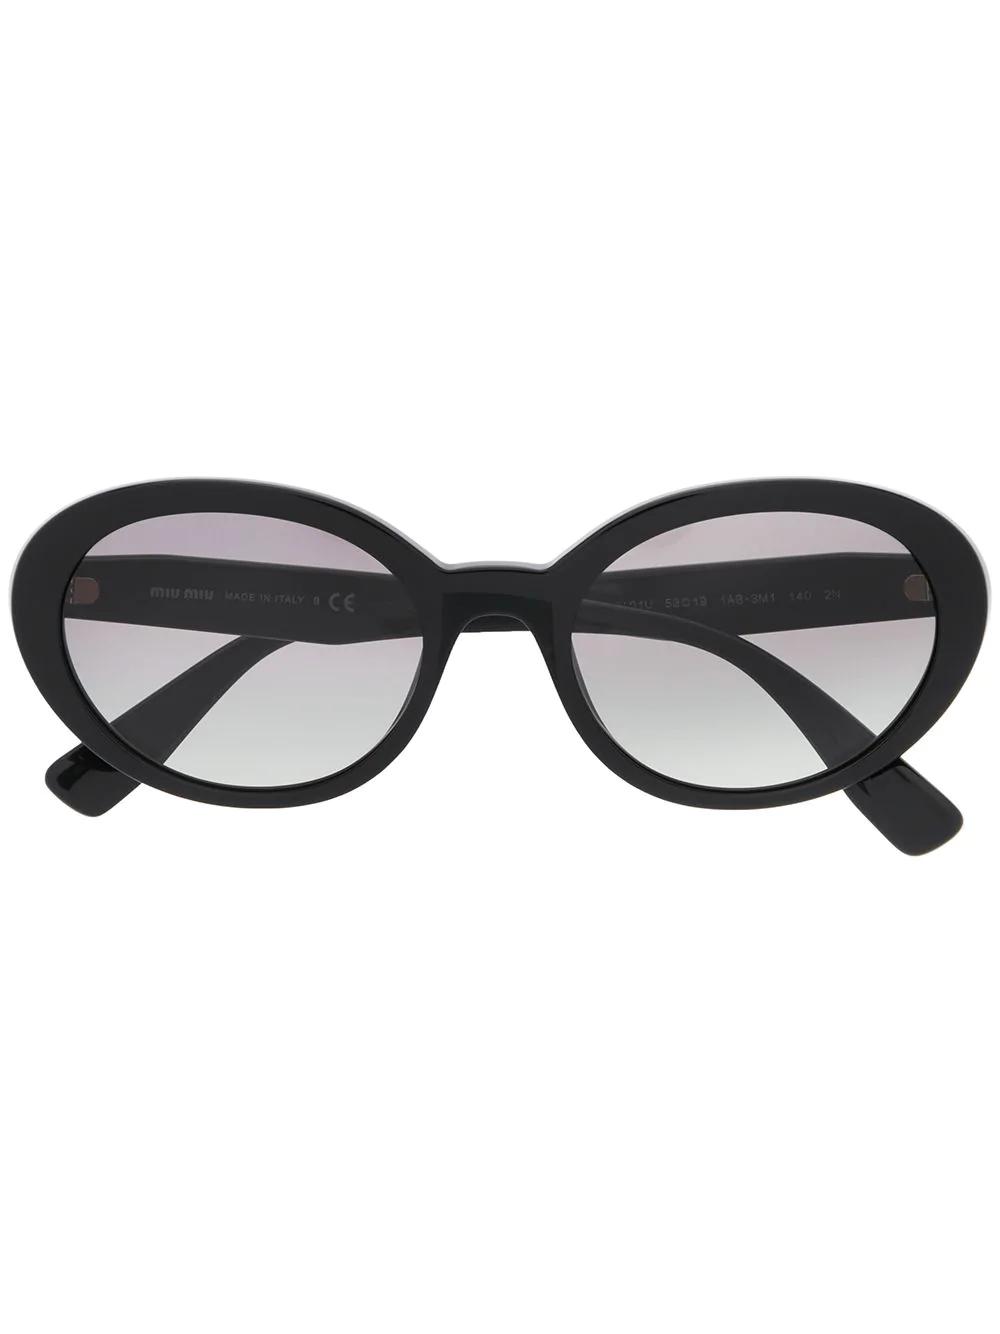 82c7d46d879 Miu Miu Eyewear Round Frame Sunglasses - Black